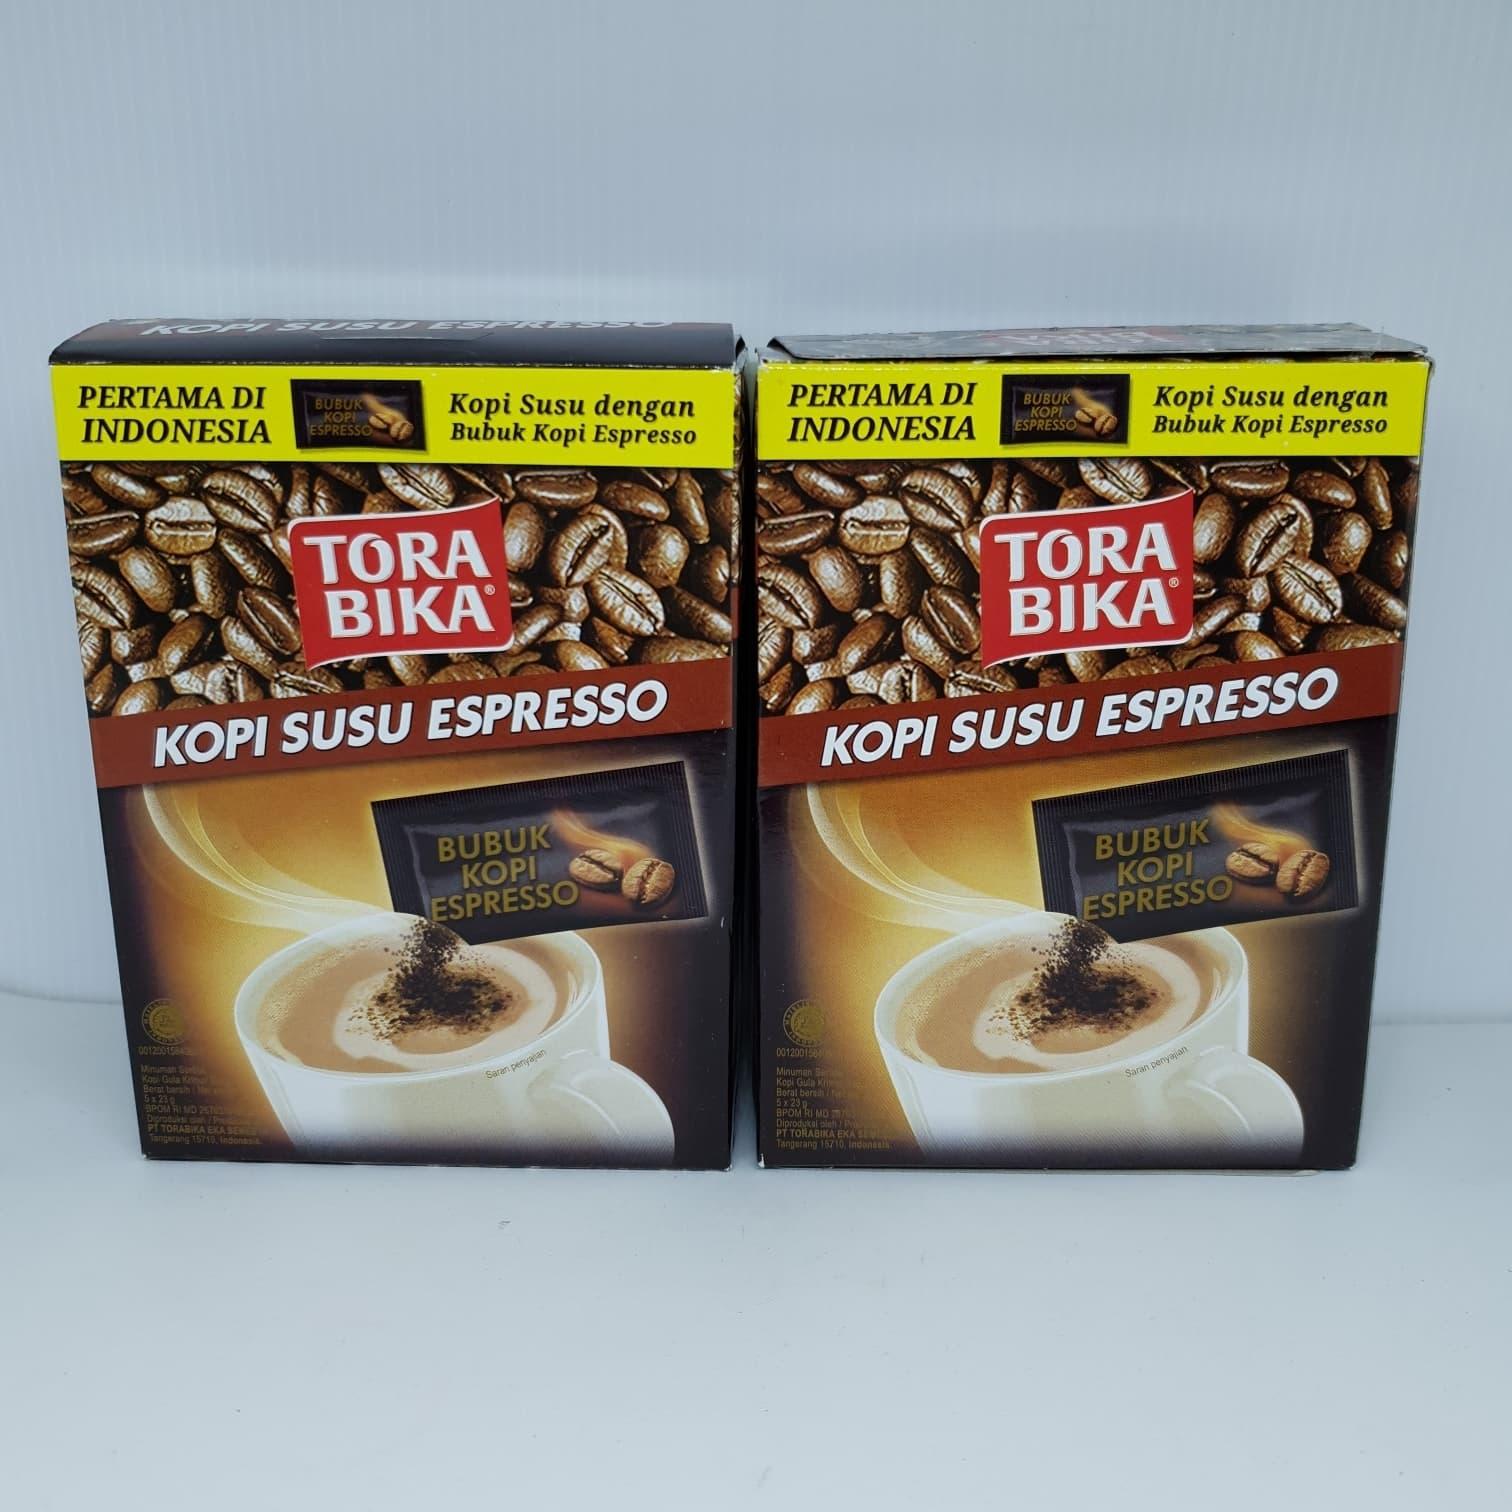 Jual Tora Bika Kopi Susu Espresso Minuman Serbuk Gula Krimer Old Town White Coffee 3 In 1 Classic Klasik Torabika